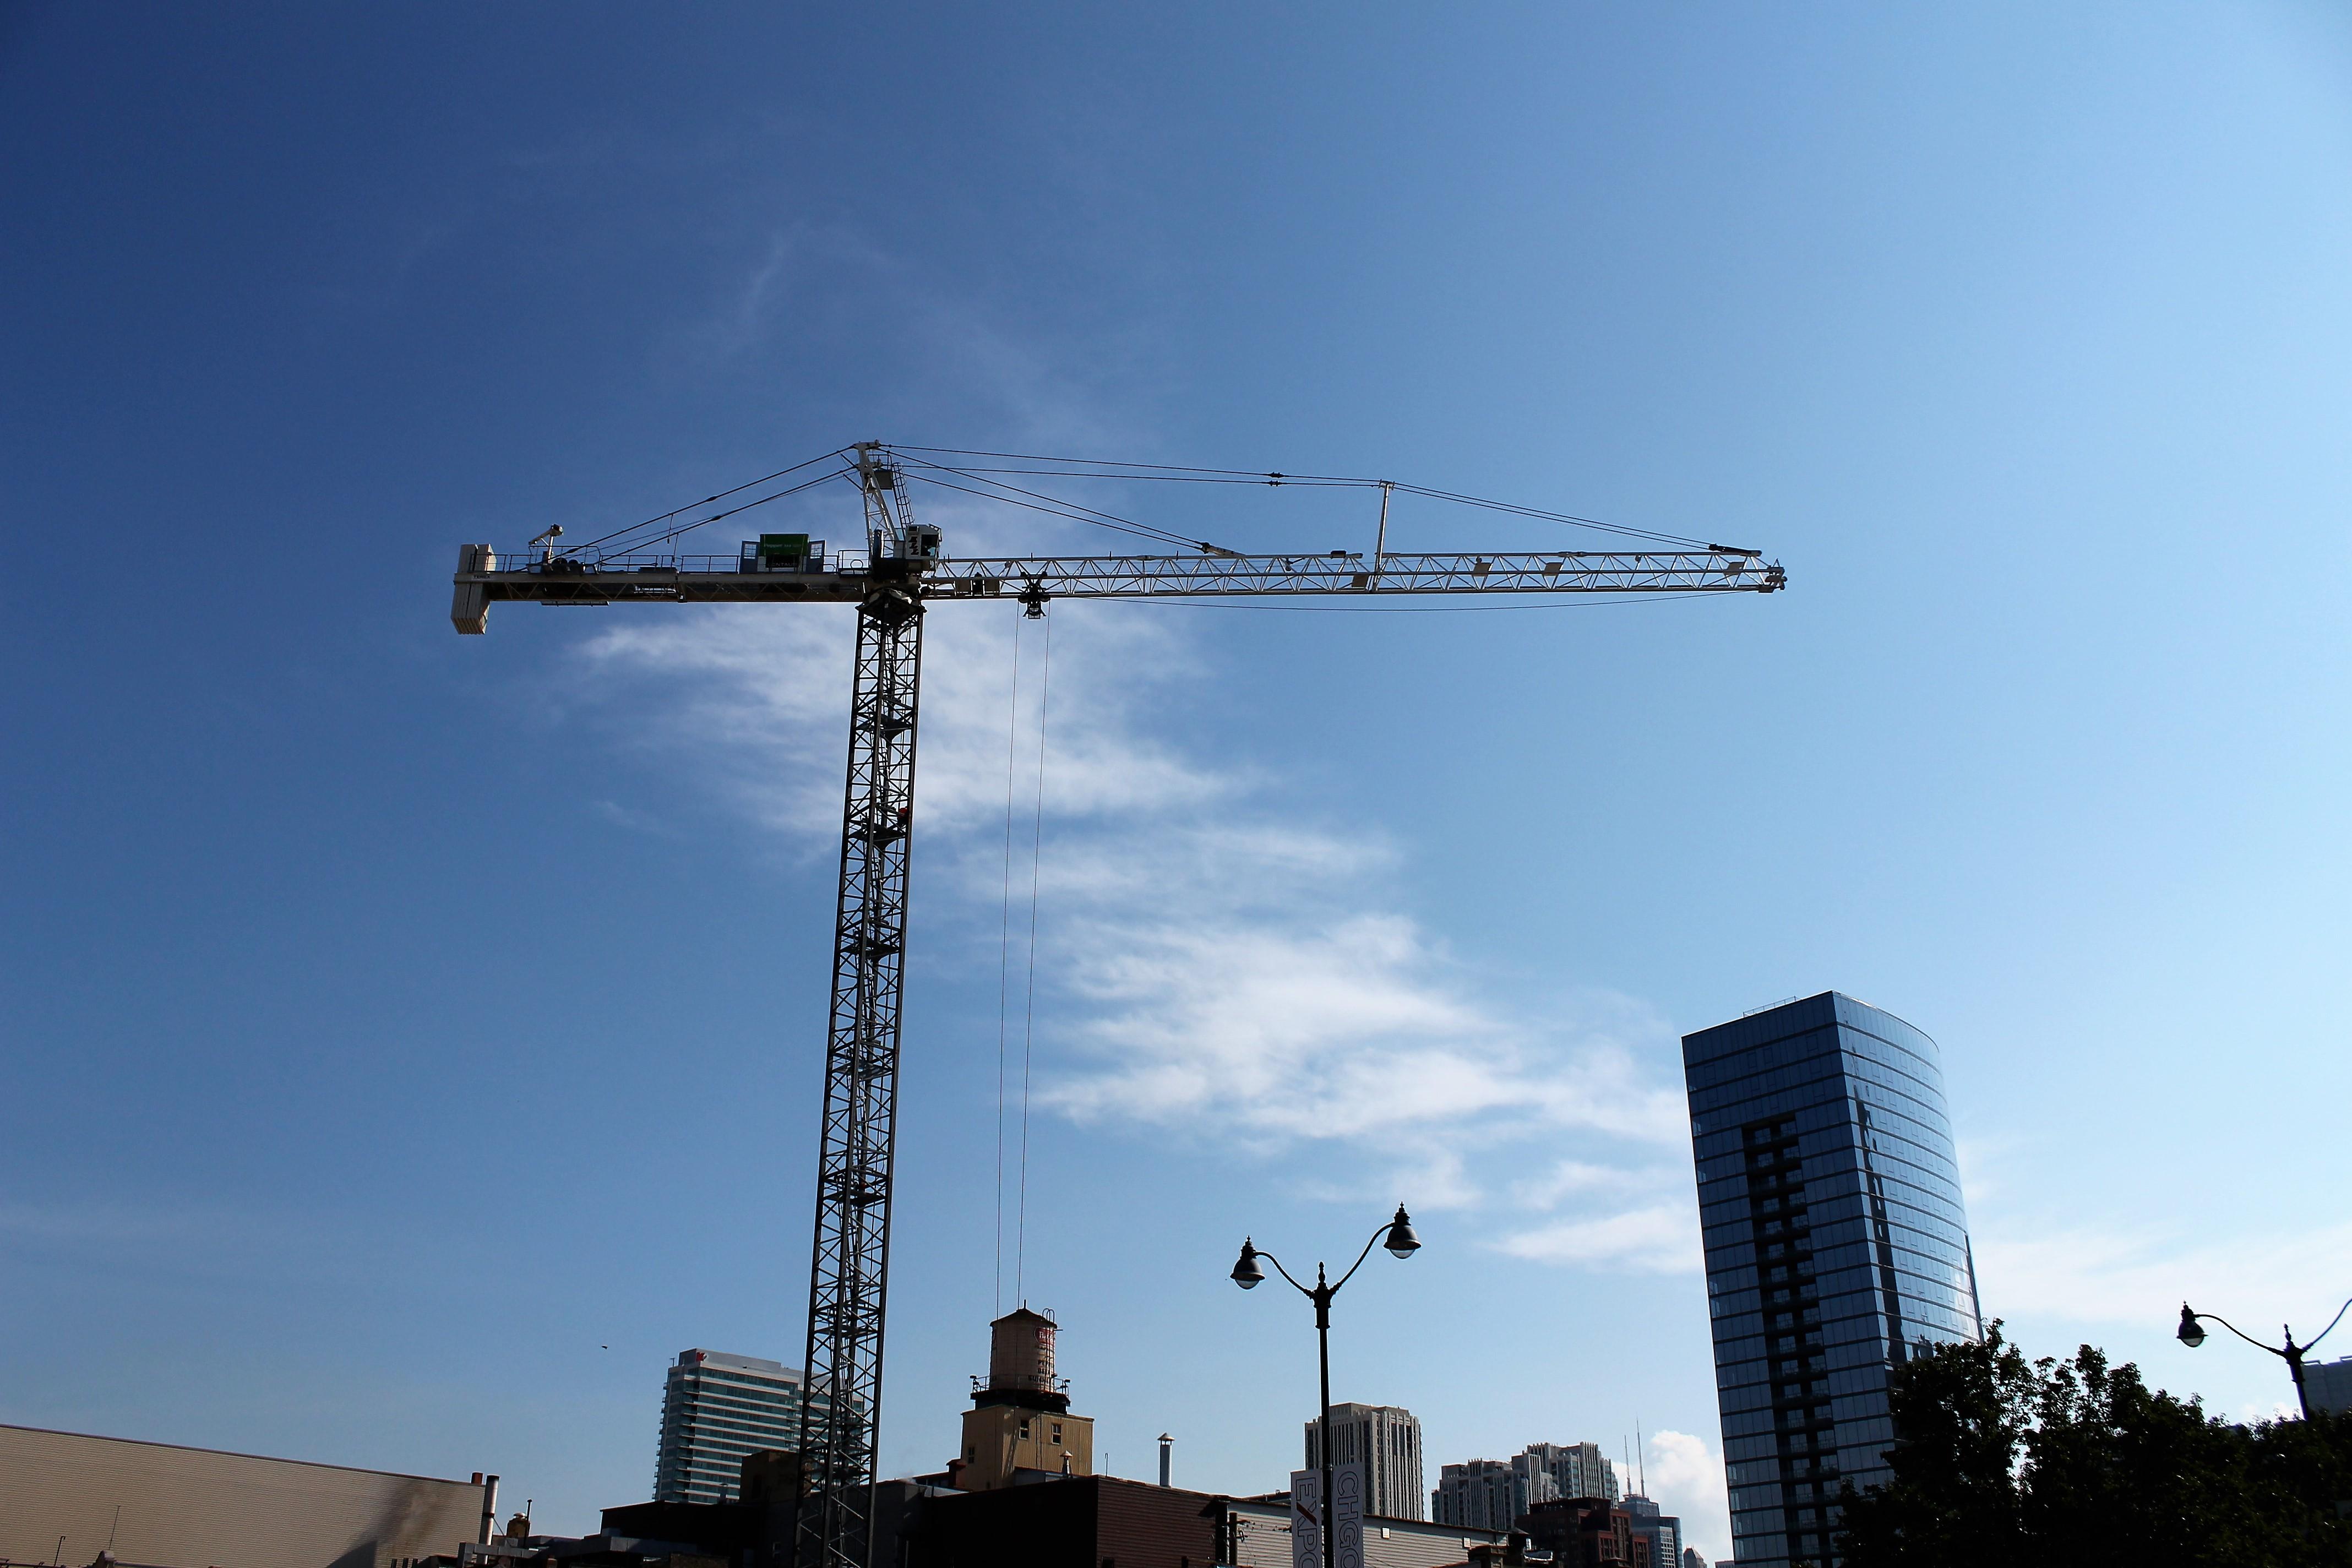 Nobu Hotel Chicago tower crane